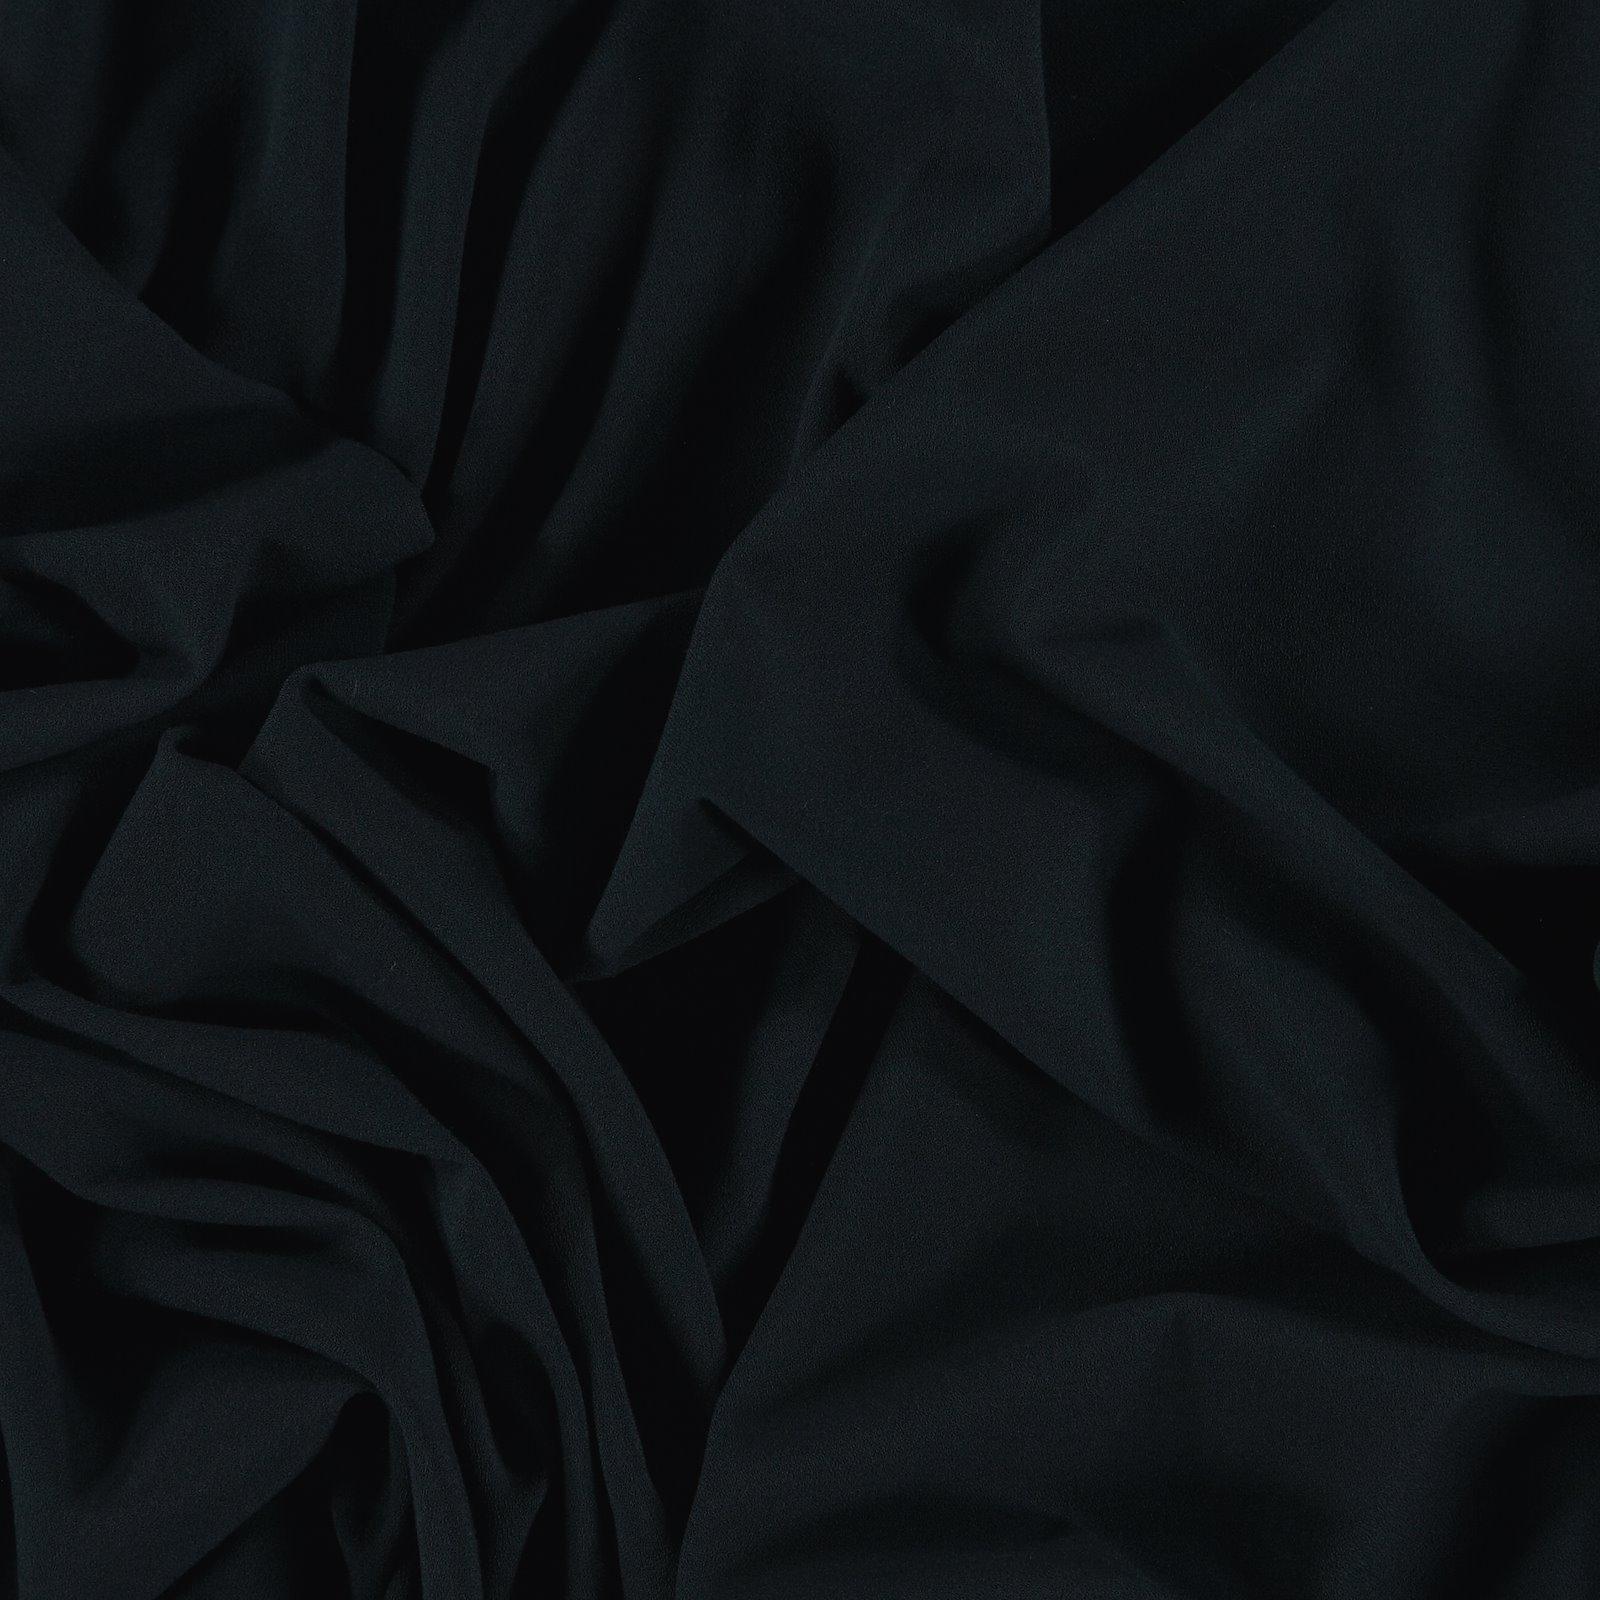 Gewebte Crepe Viskose, elastisch, Navy